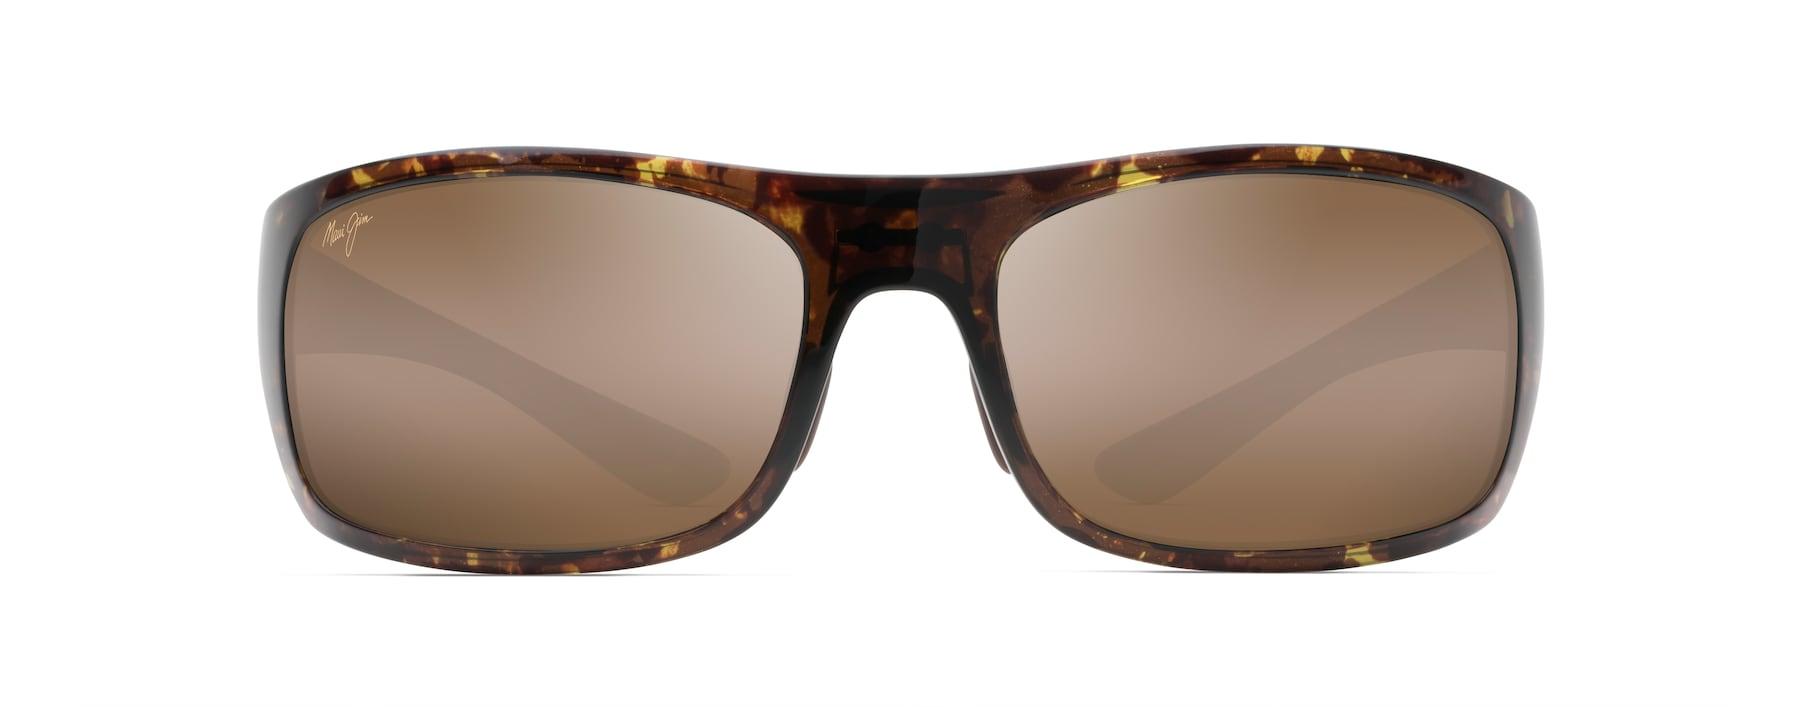 306da87610 Big Wave Polarised Sunglasses